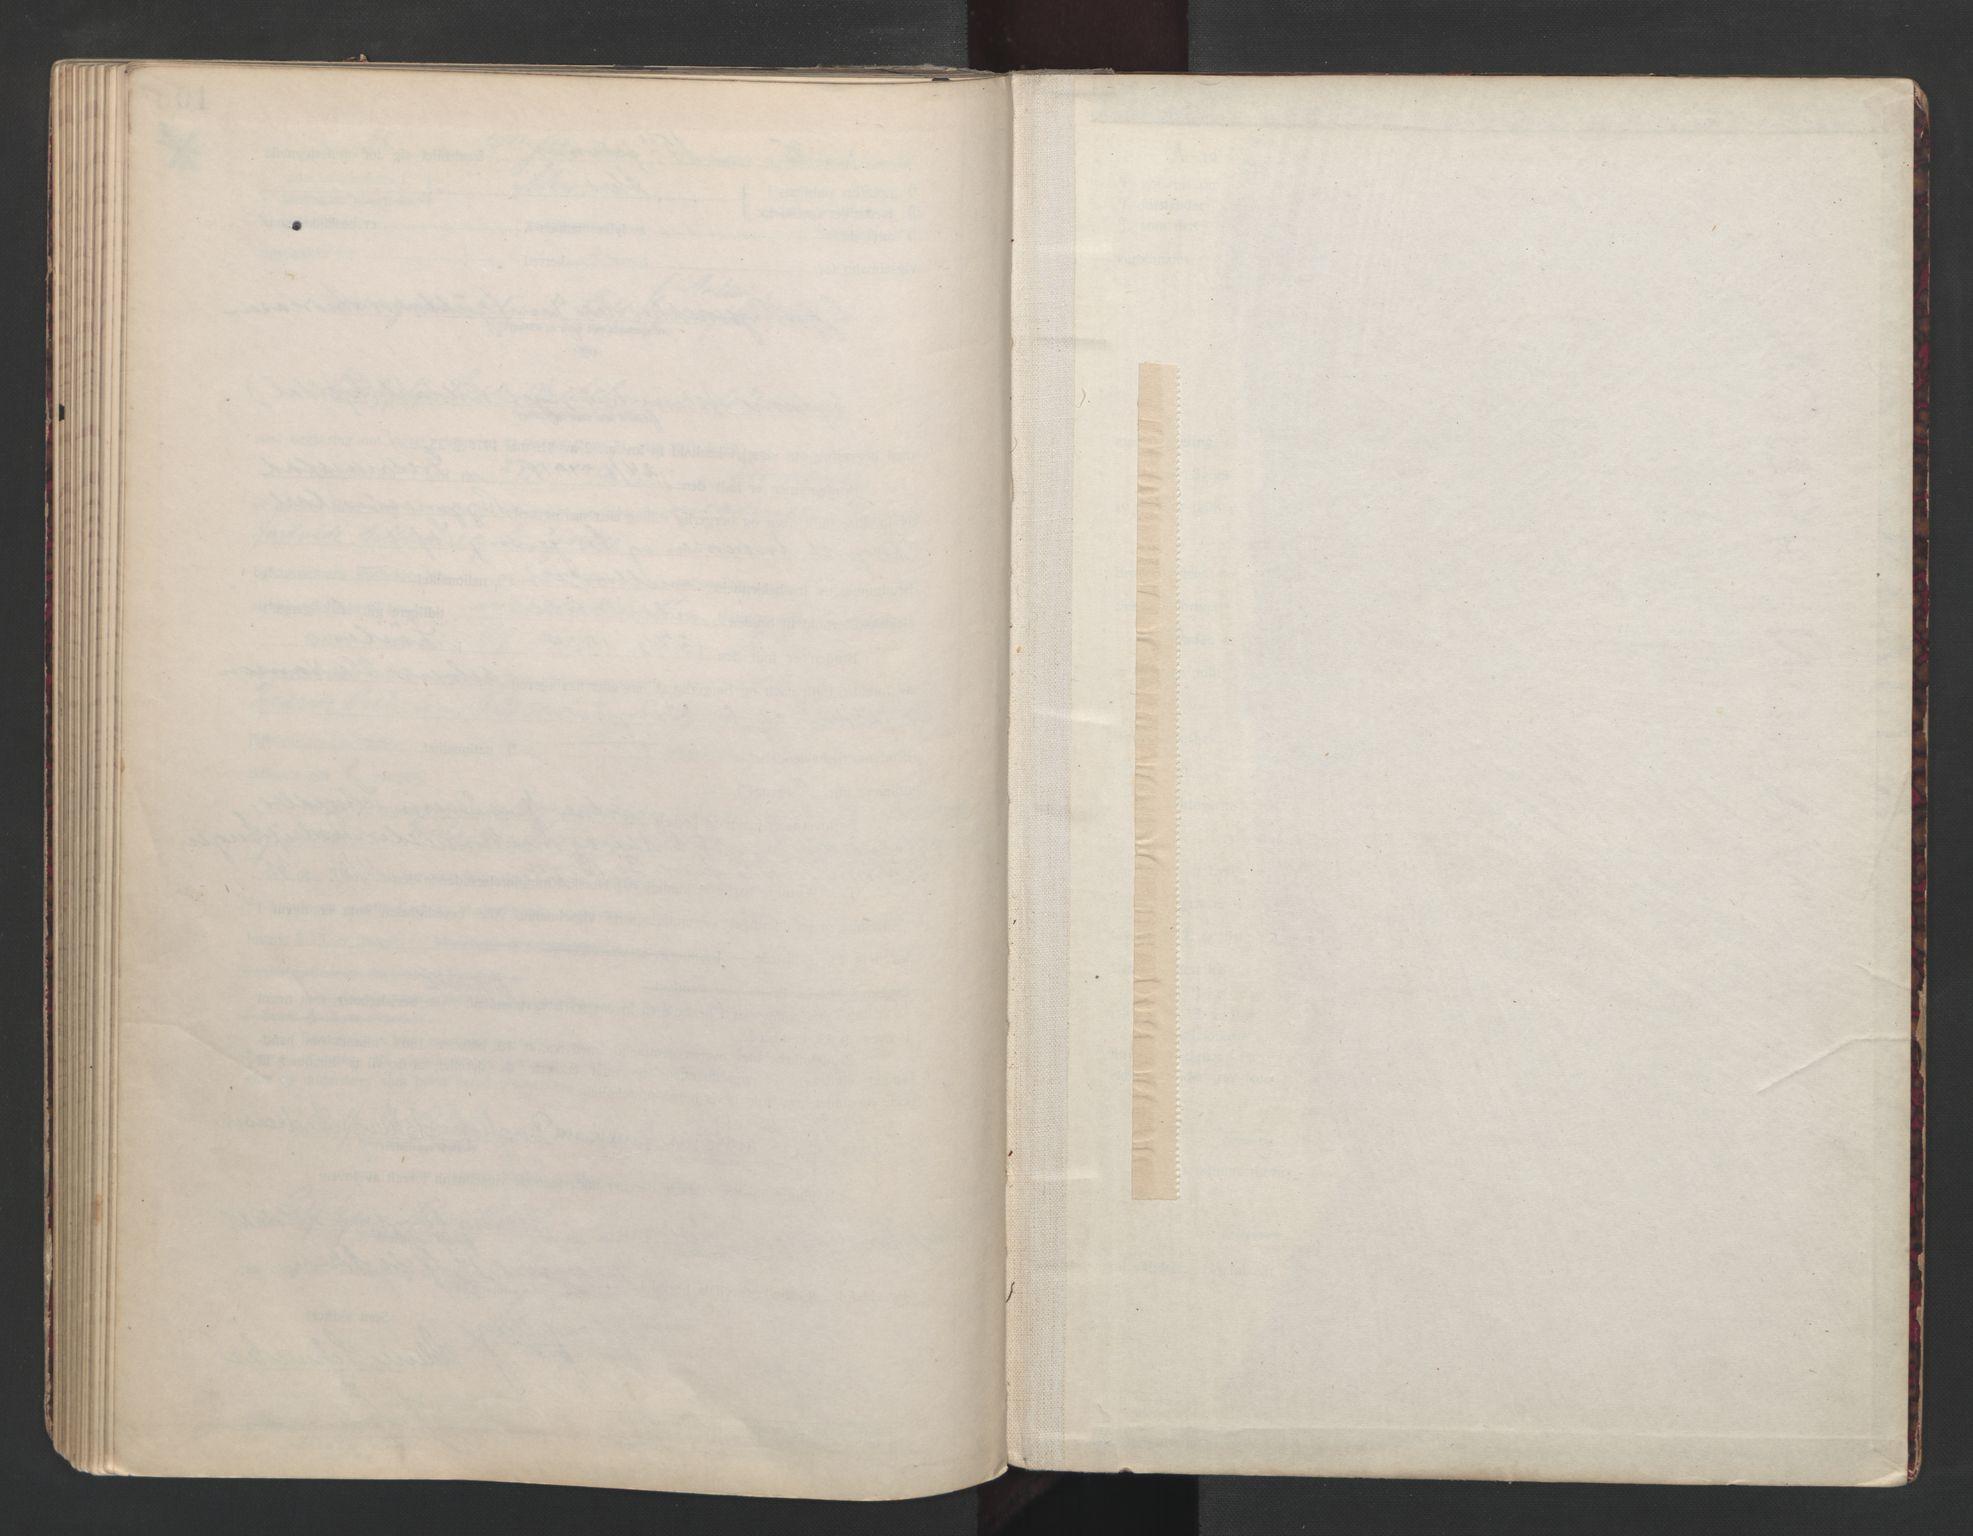 SAO, Aker sorenskriveri, L/Lc/Lcb/L0007: Vigselprotokoll, 1933-1935, s. upaginert